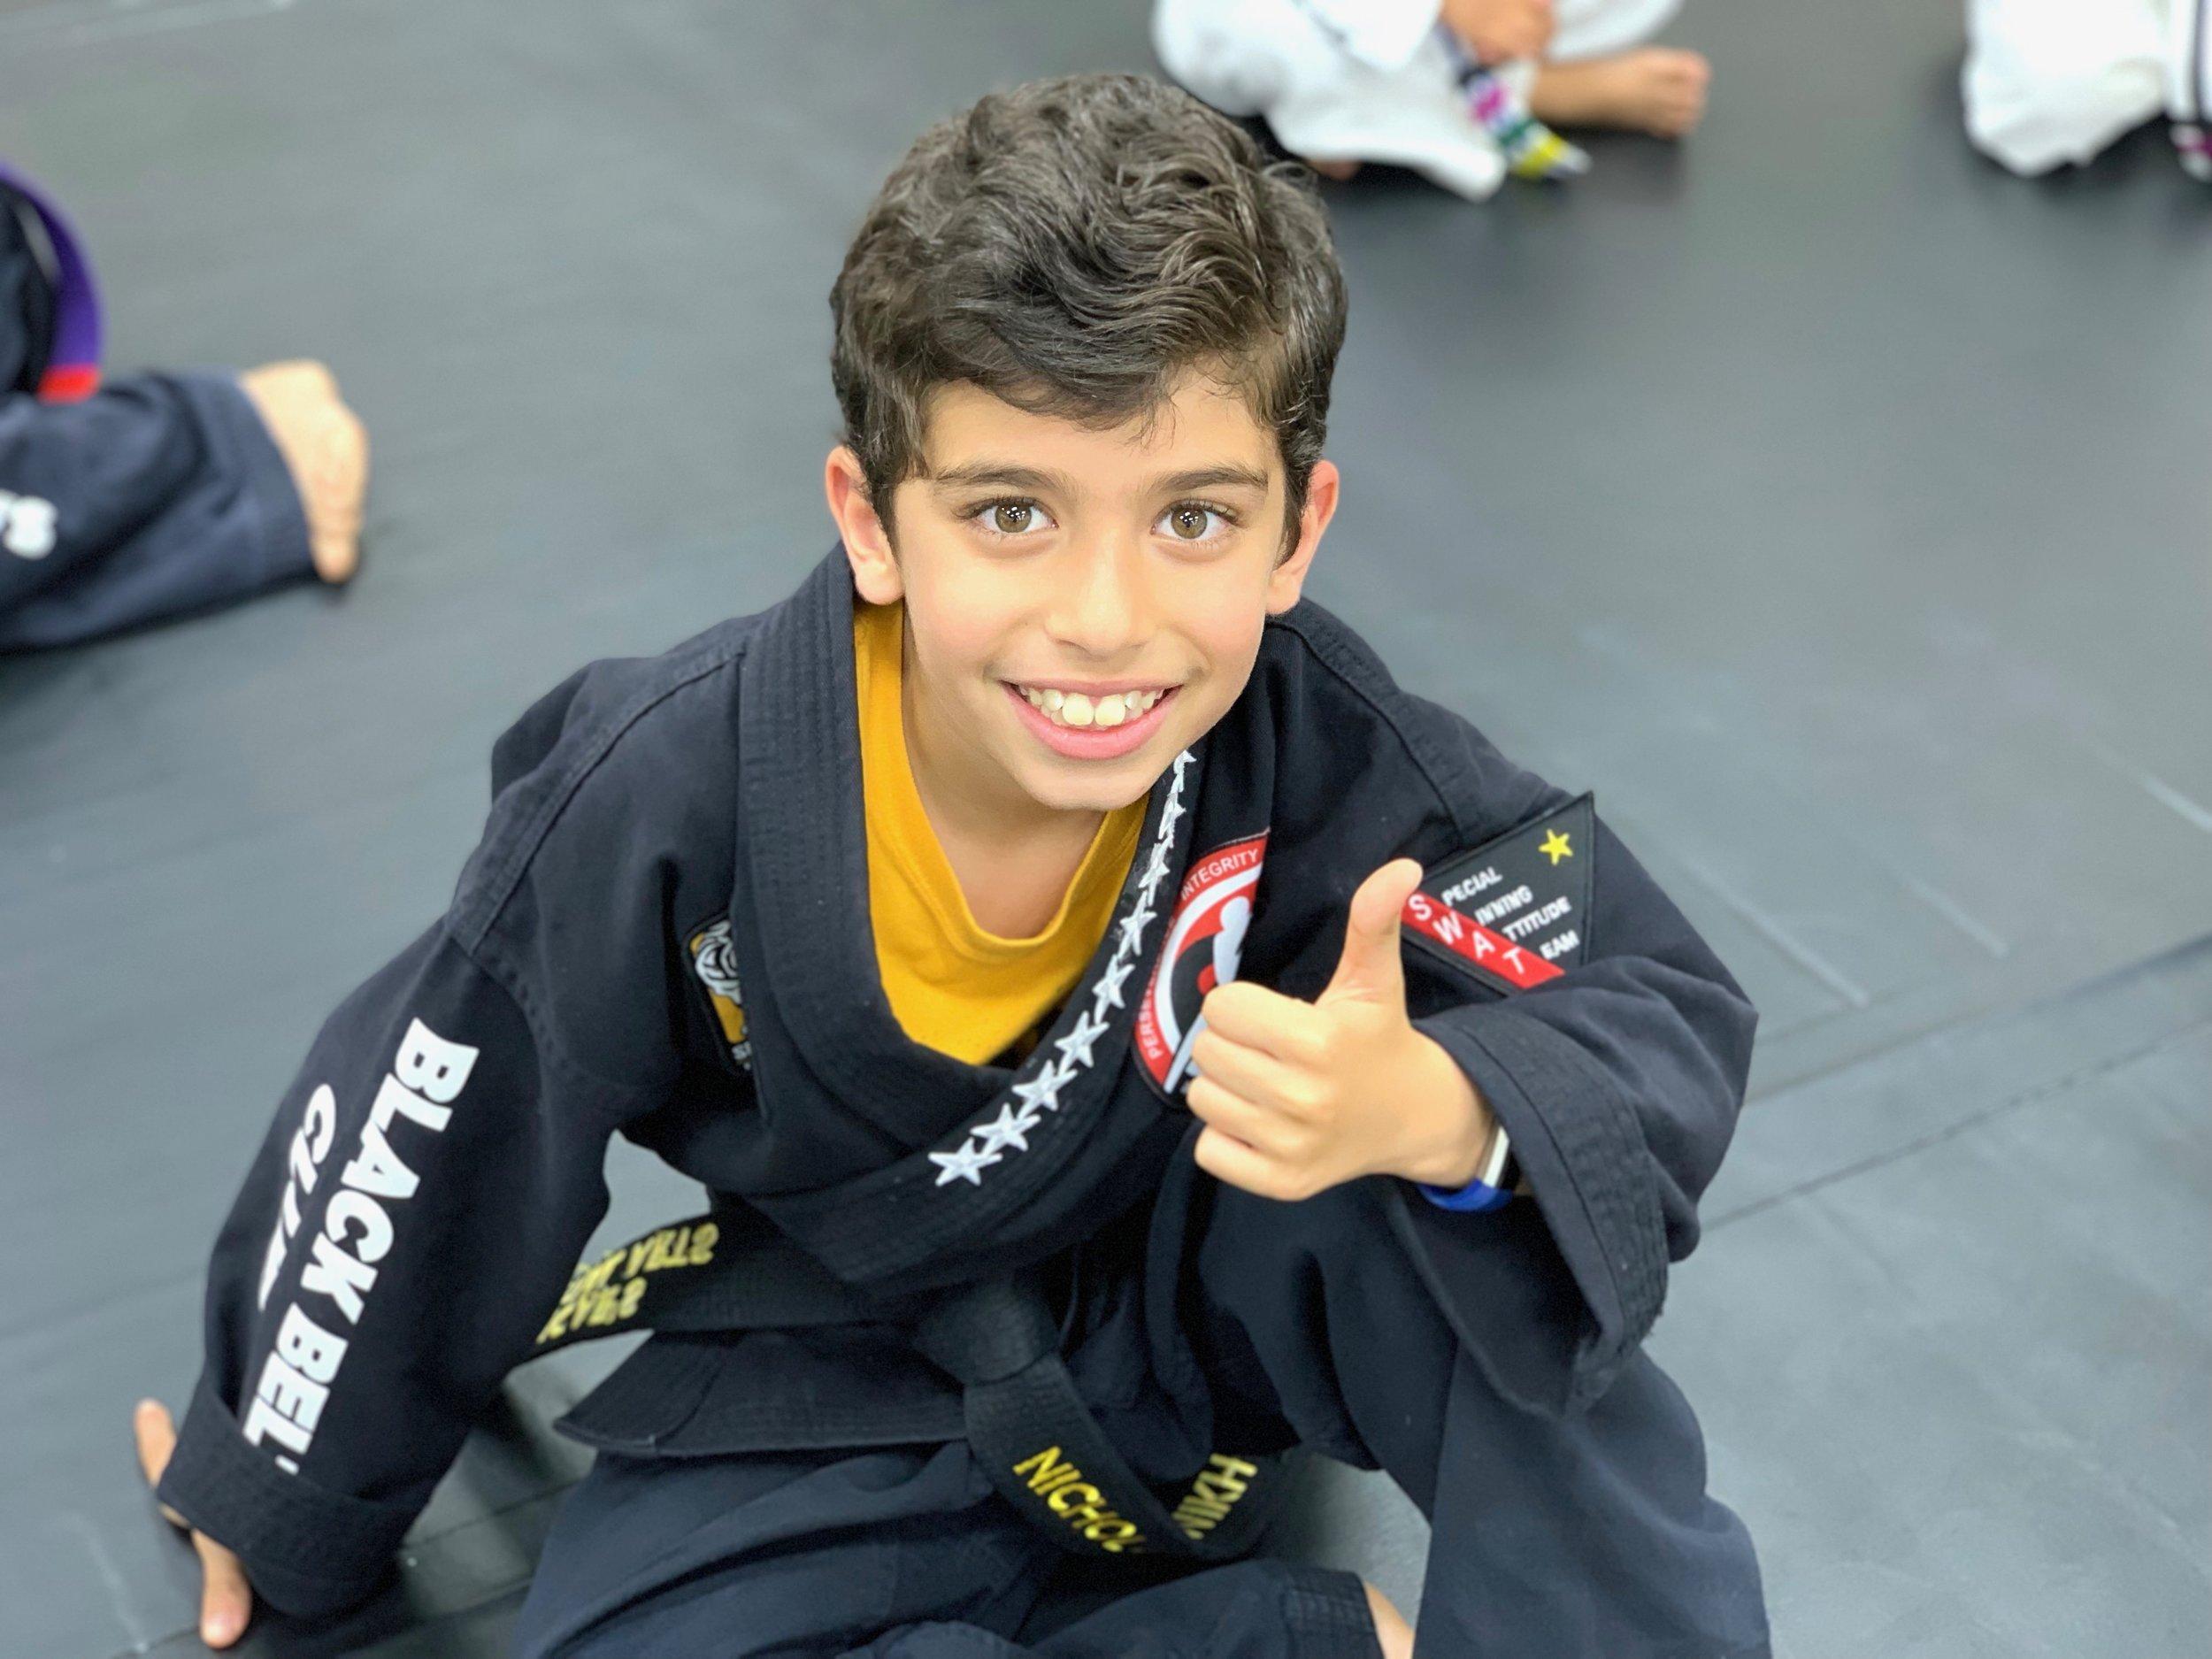 karate-kids-program-souhtlake-keller-grapevine-texas00017.jpeg